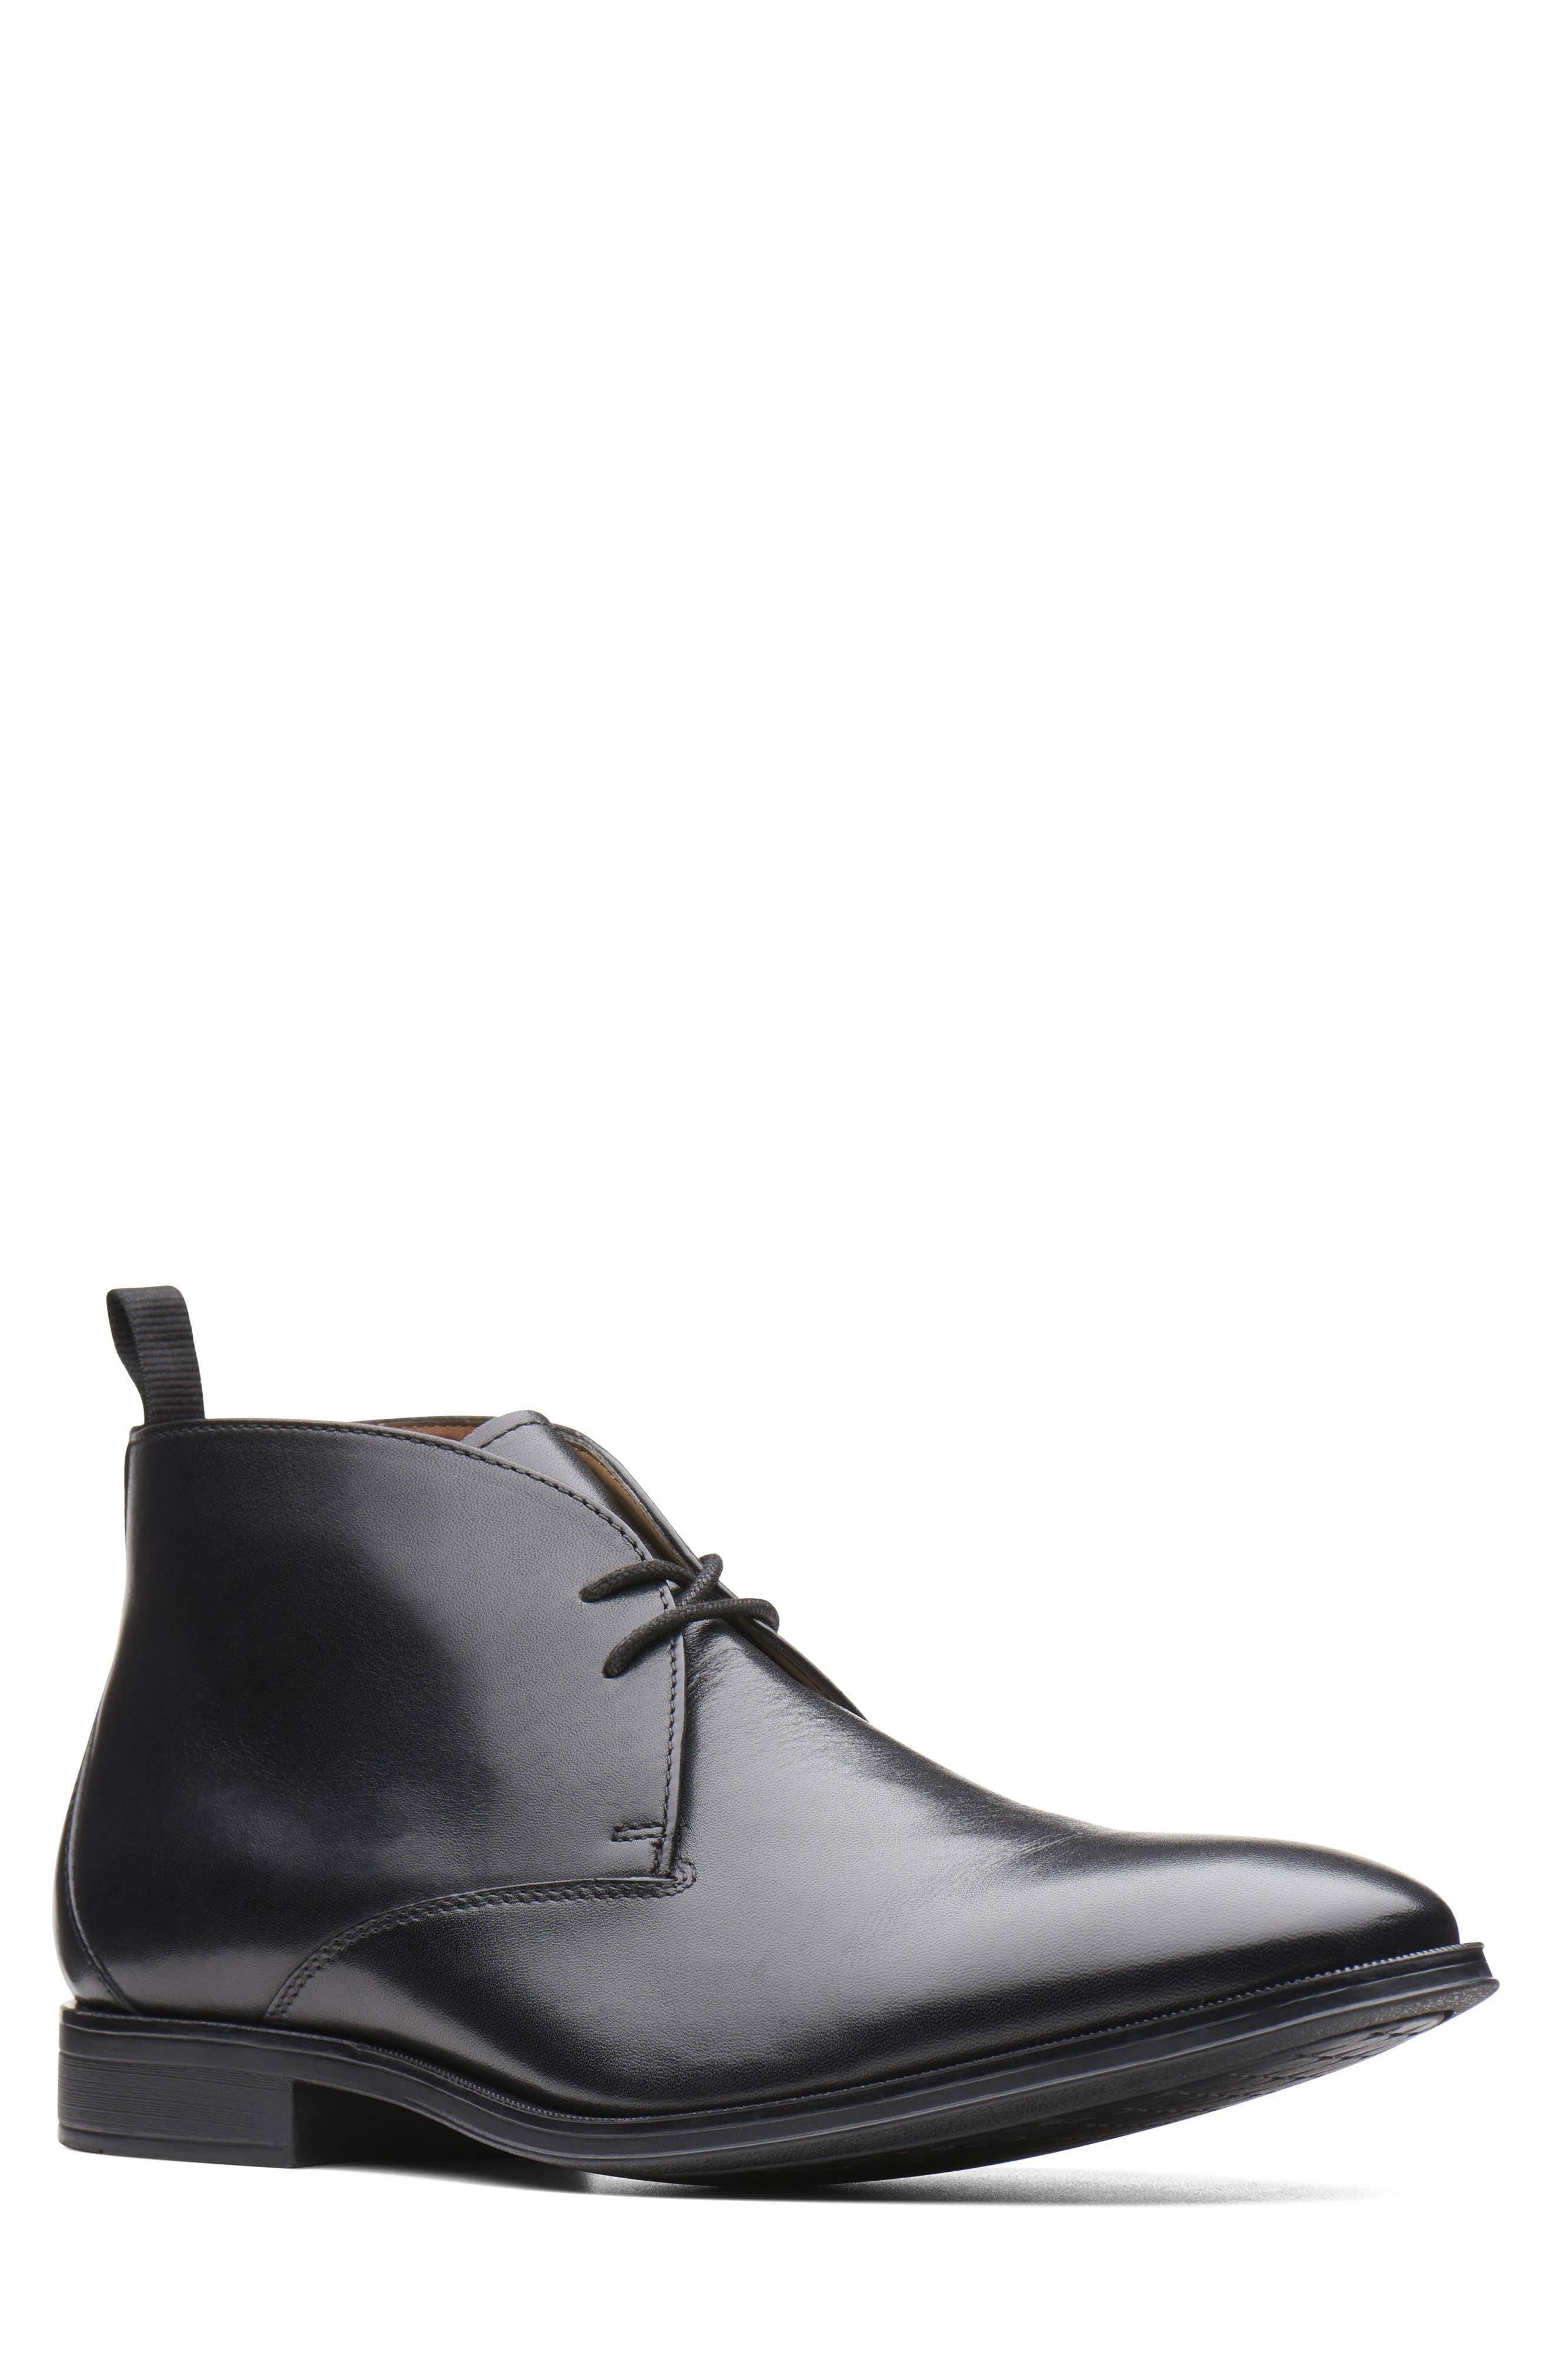 Gilman Mid Chukka Boot, Main, color, BLACK LEATHER